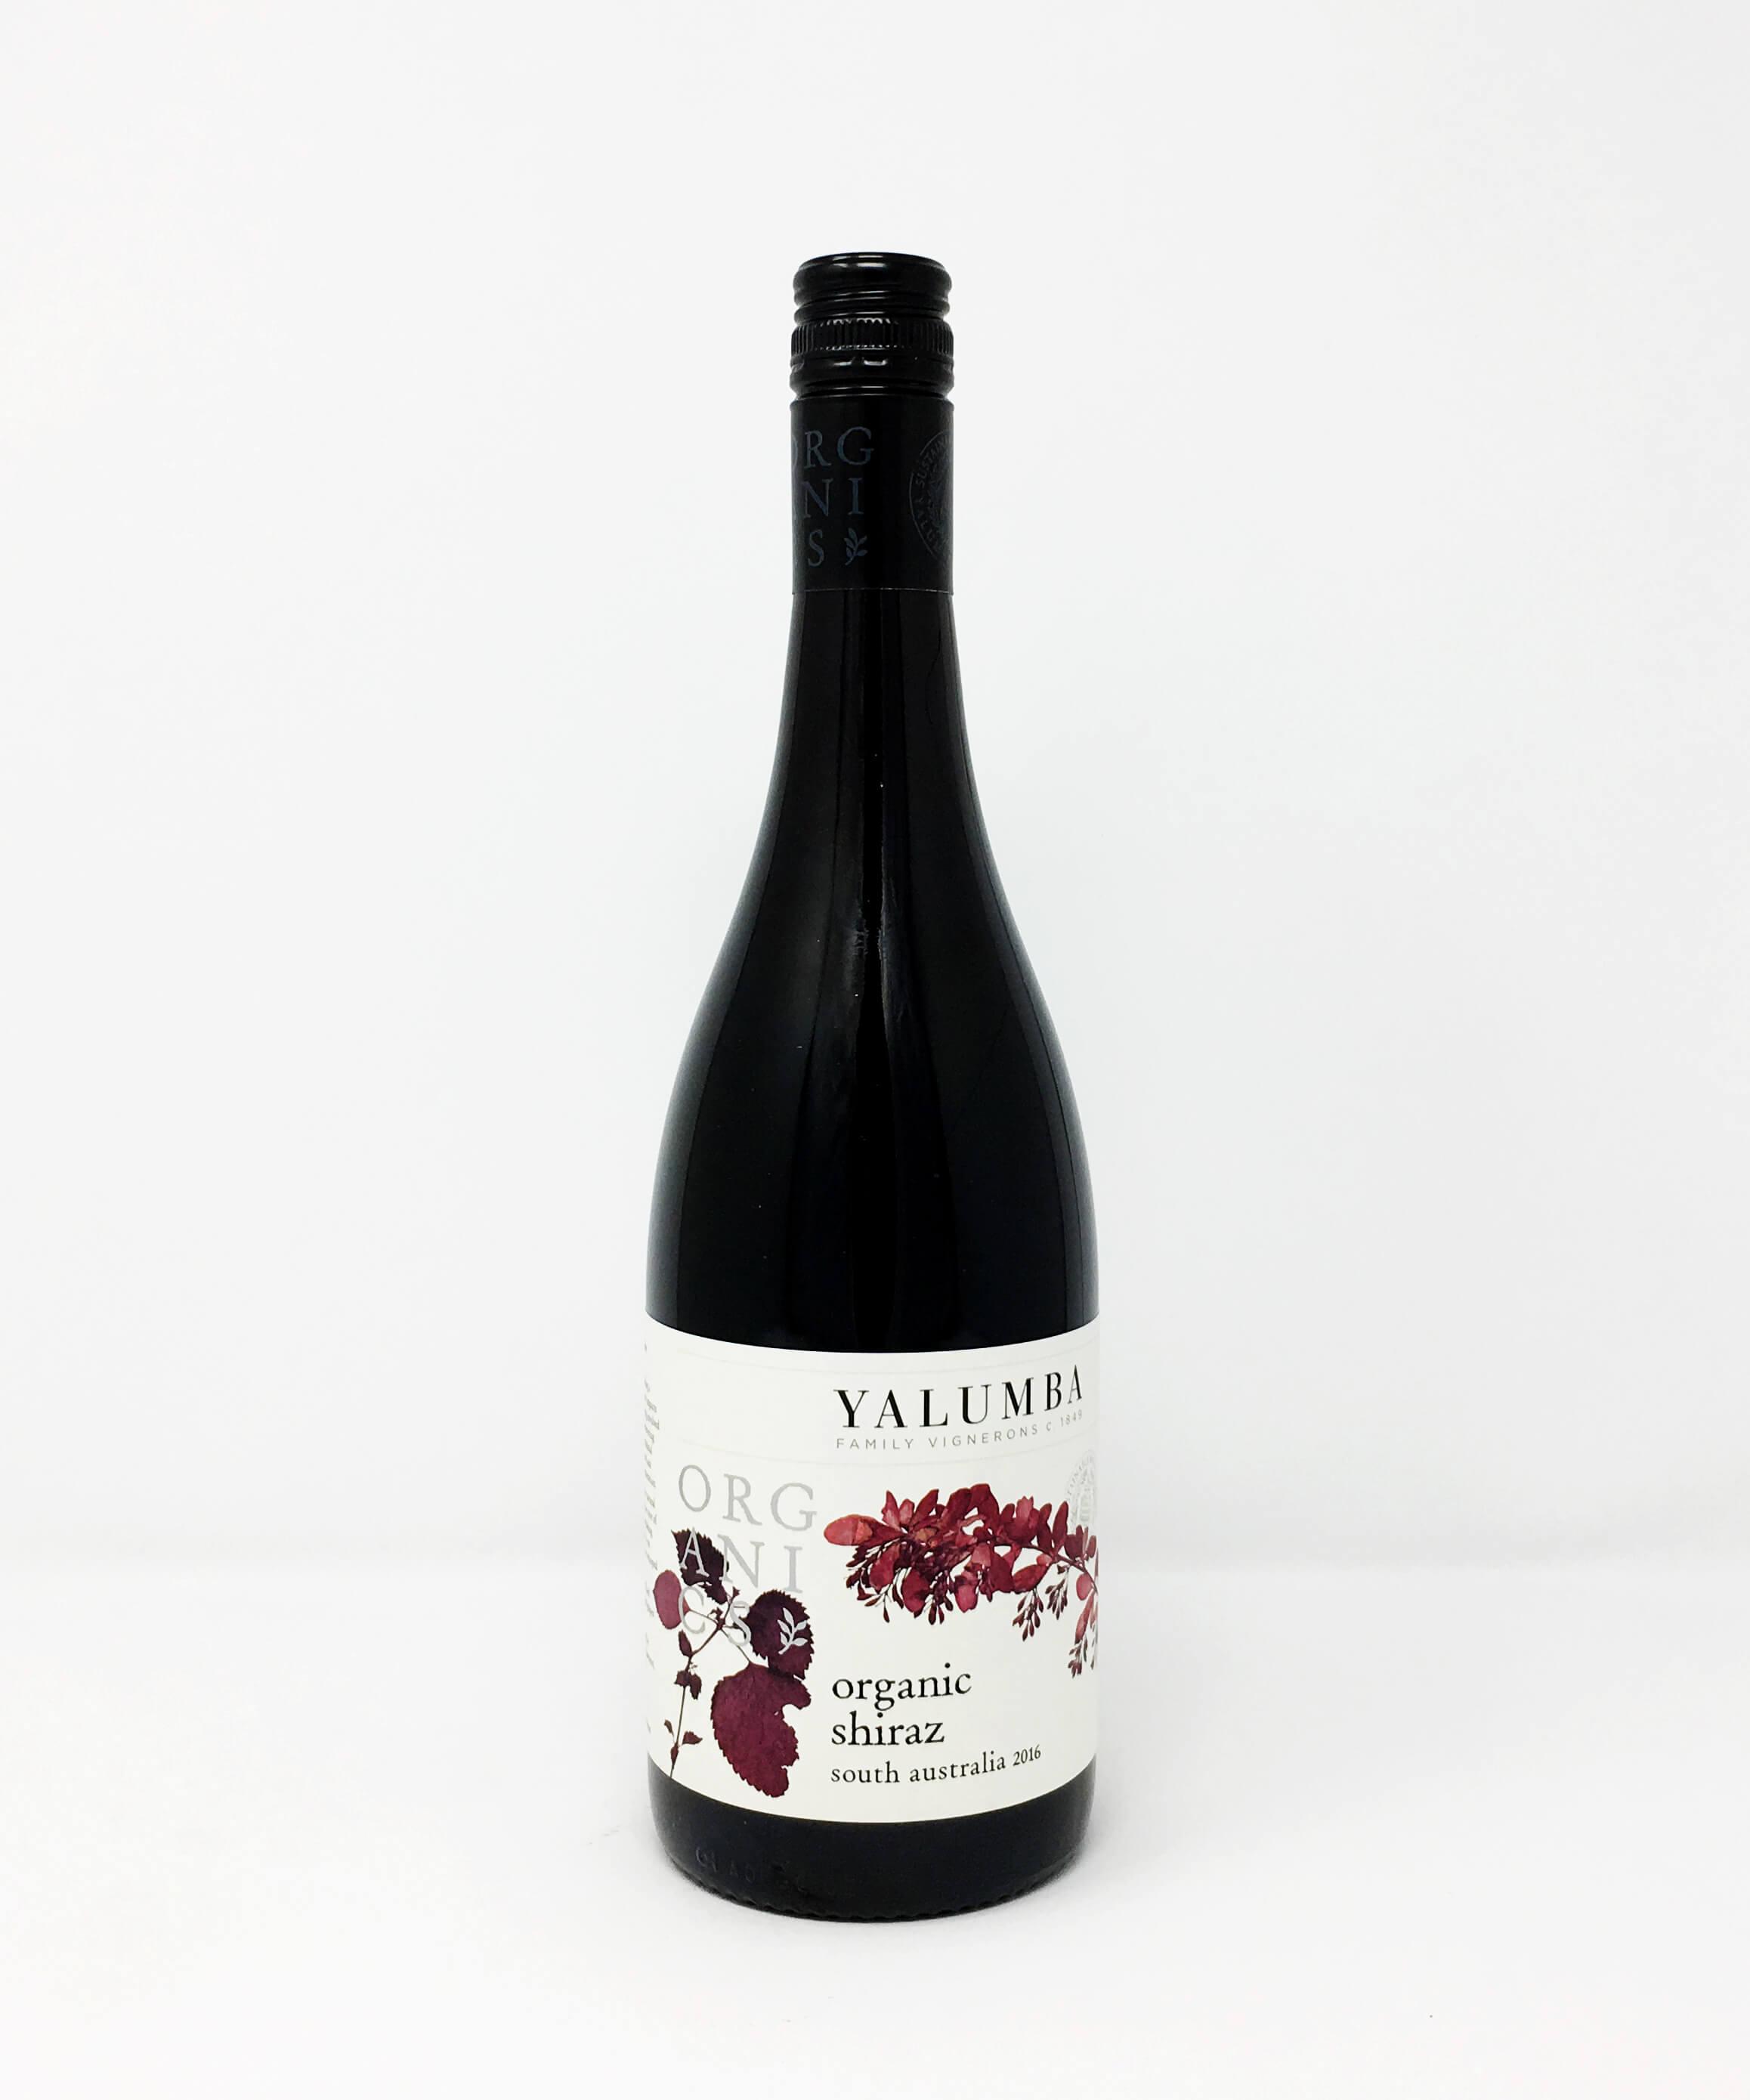 Yalumba, Organic, Shiraz